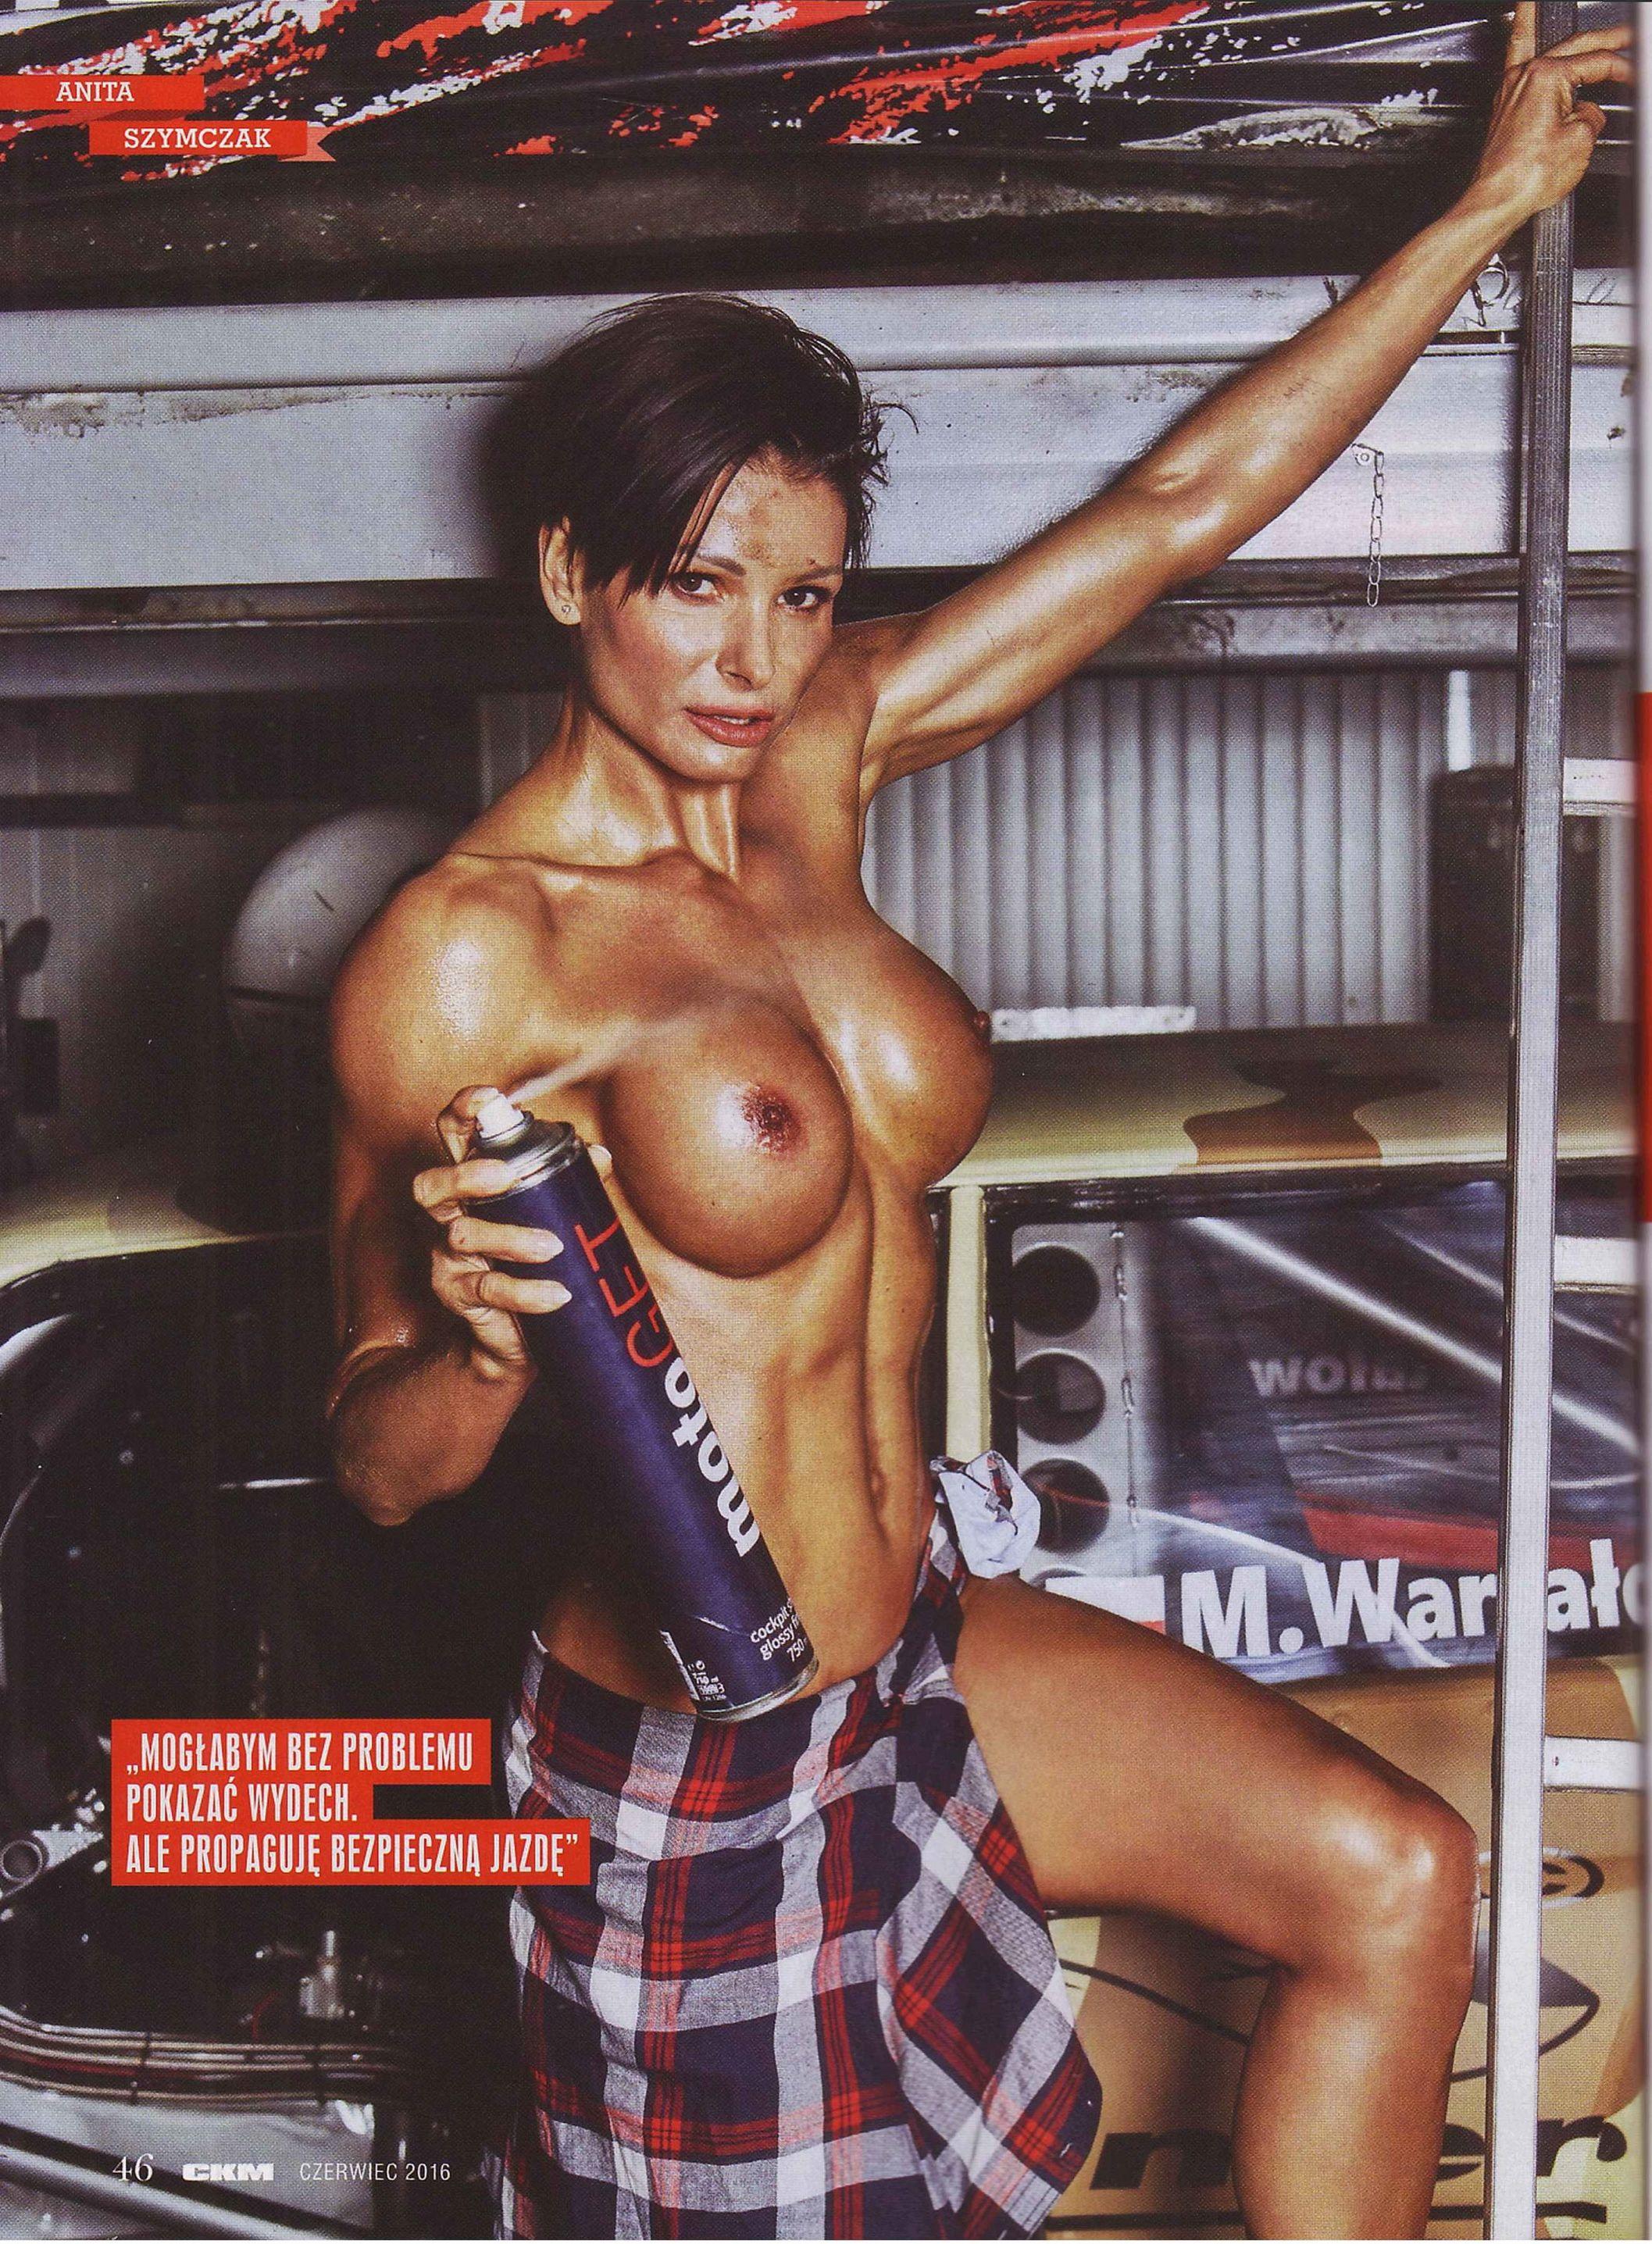 Anita Szymczak topless – CKM Poland – June 2016 (3)